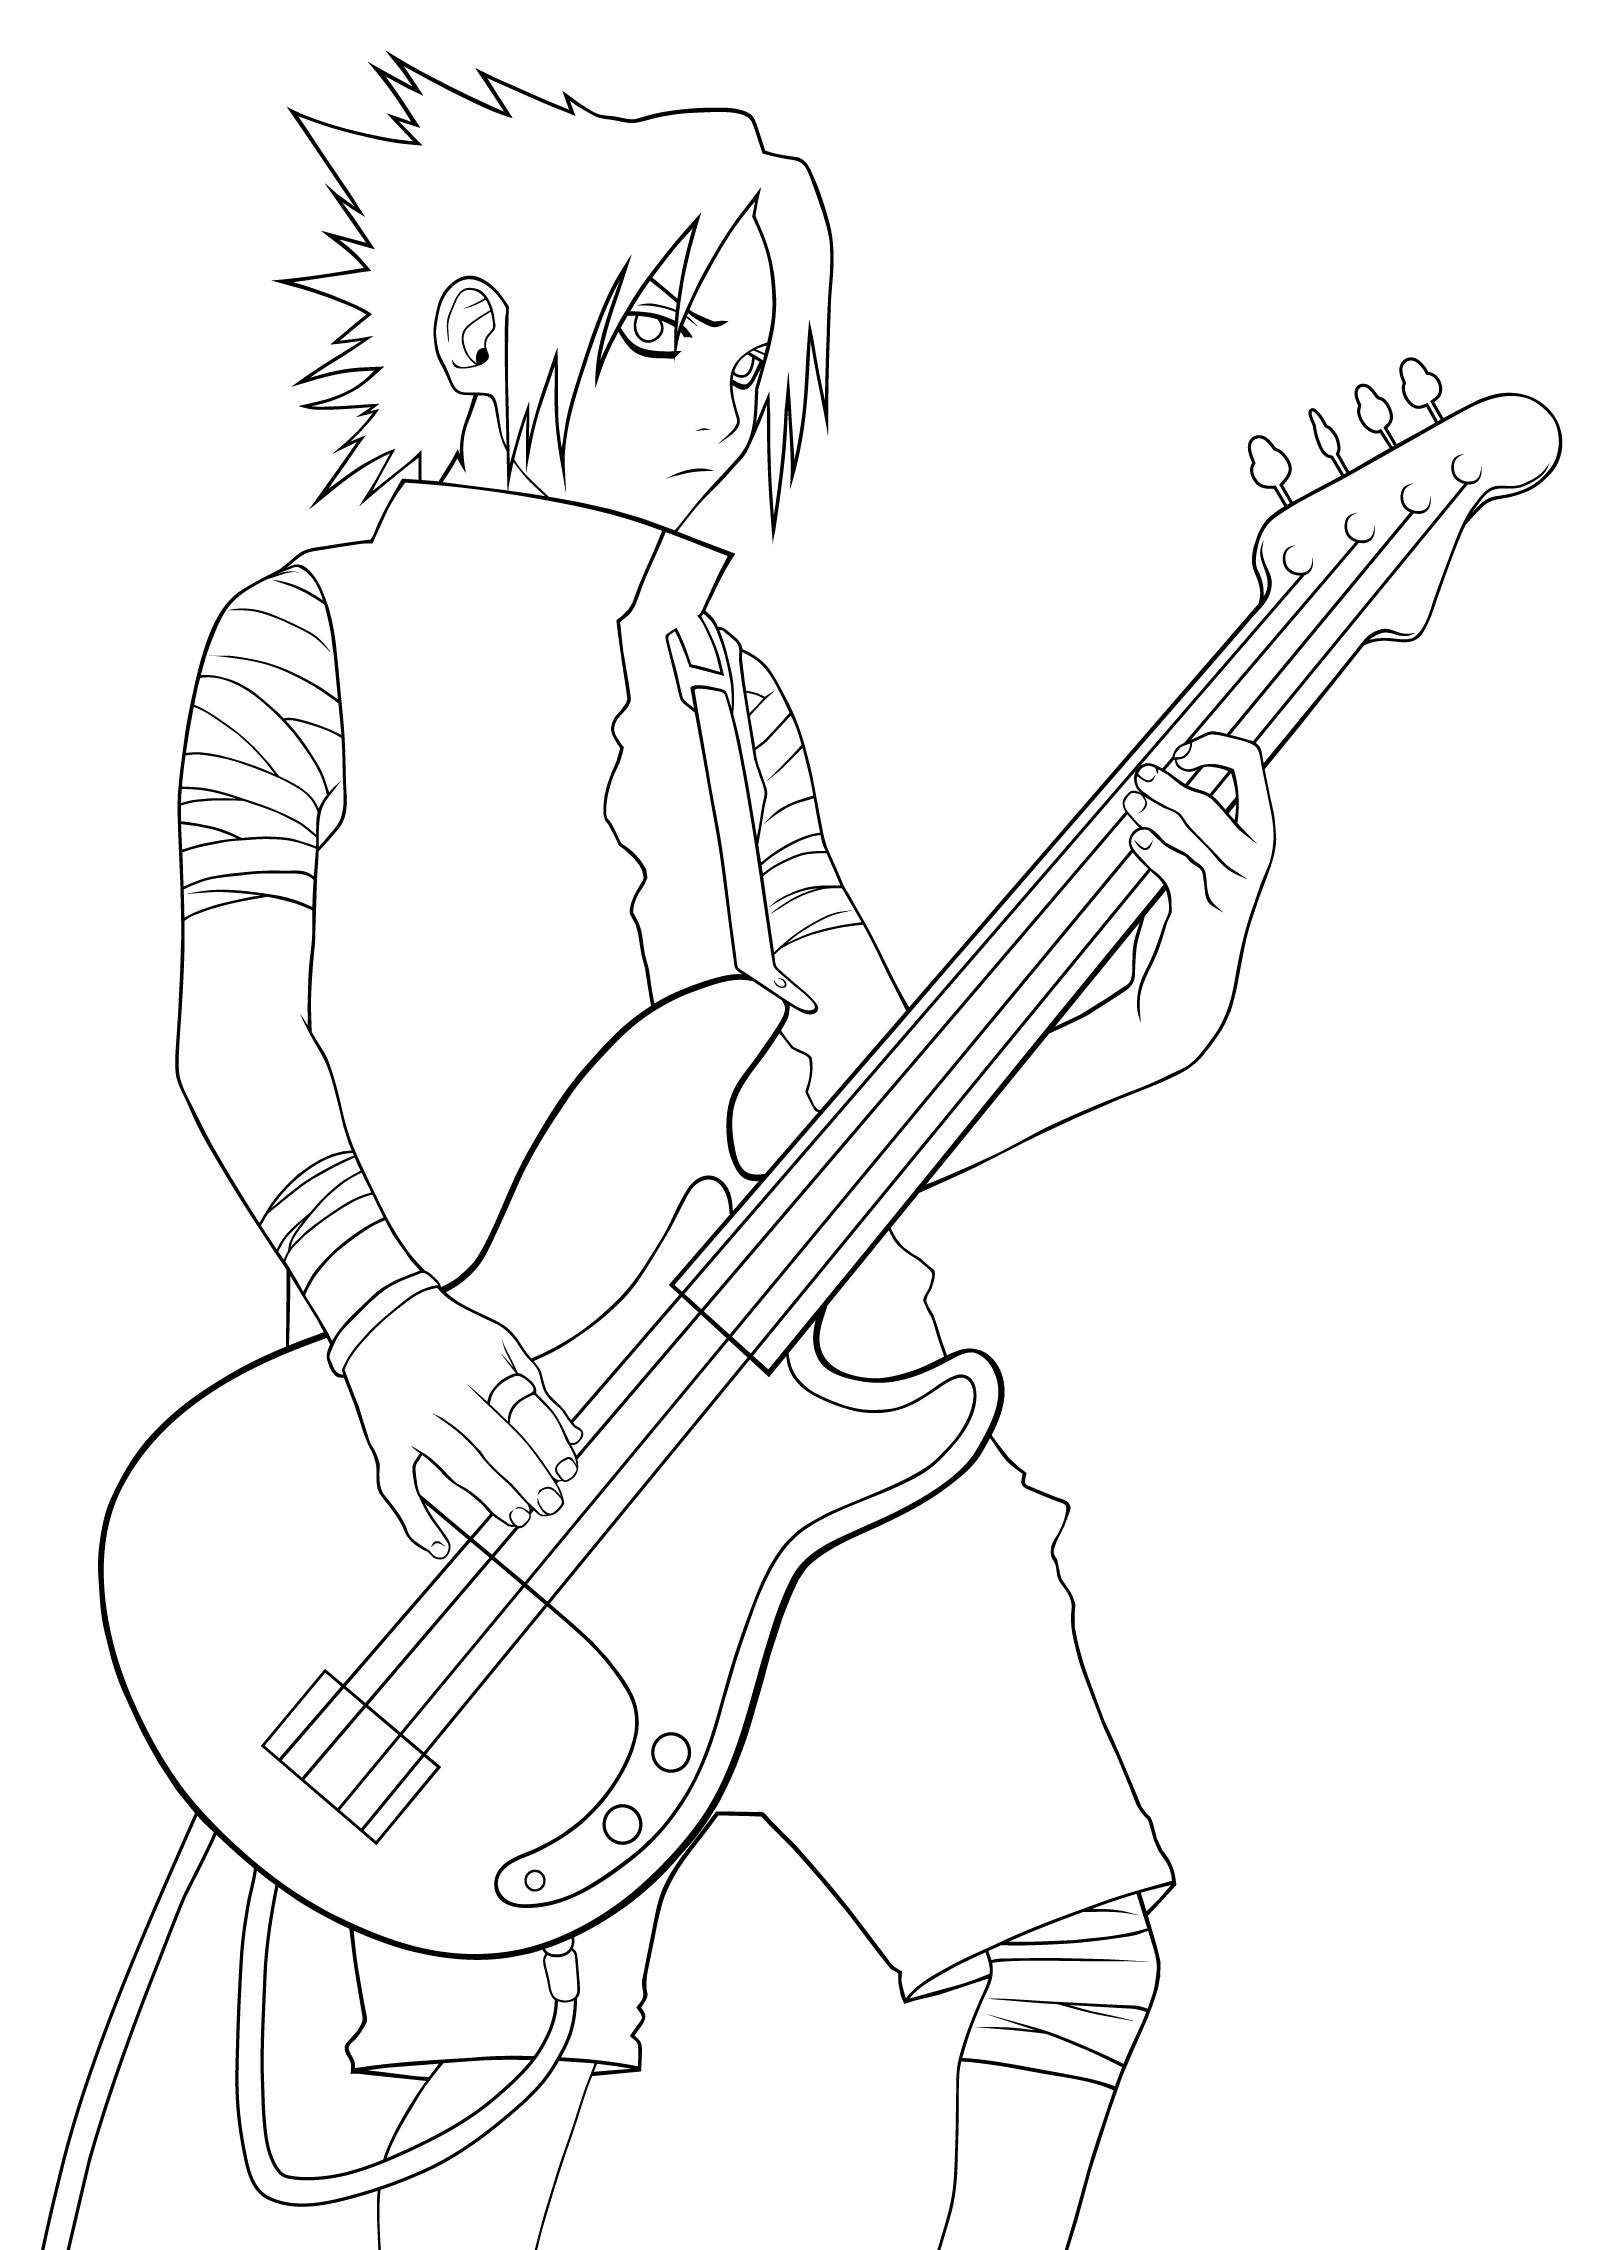 Раскраска Наруто: Саске с гитарой - Раскраски Наруто ...